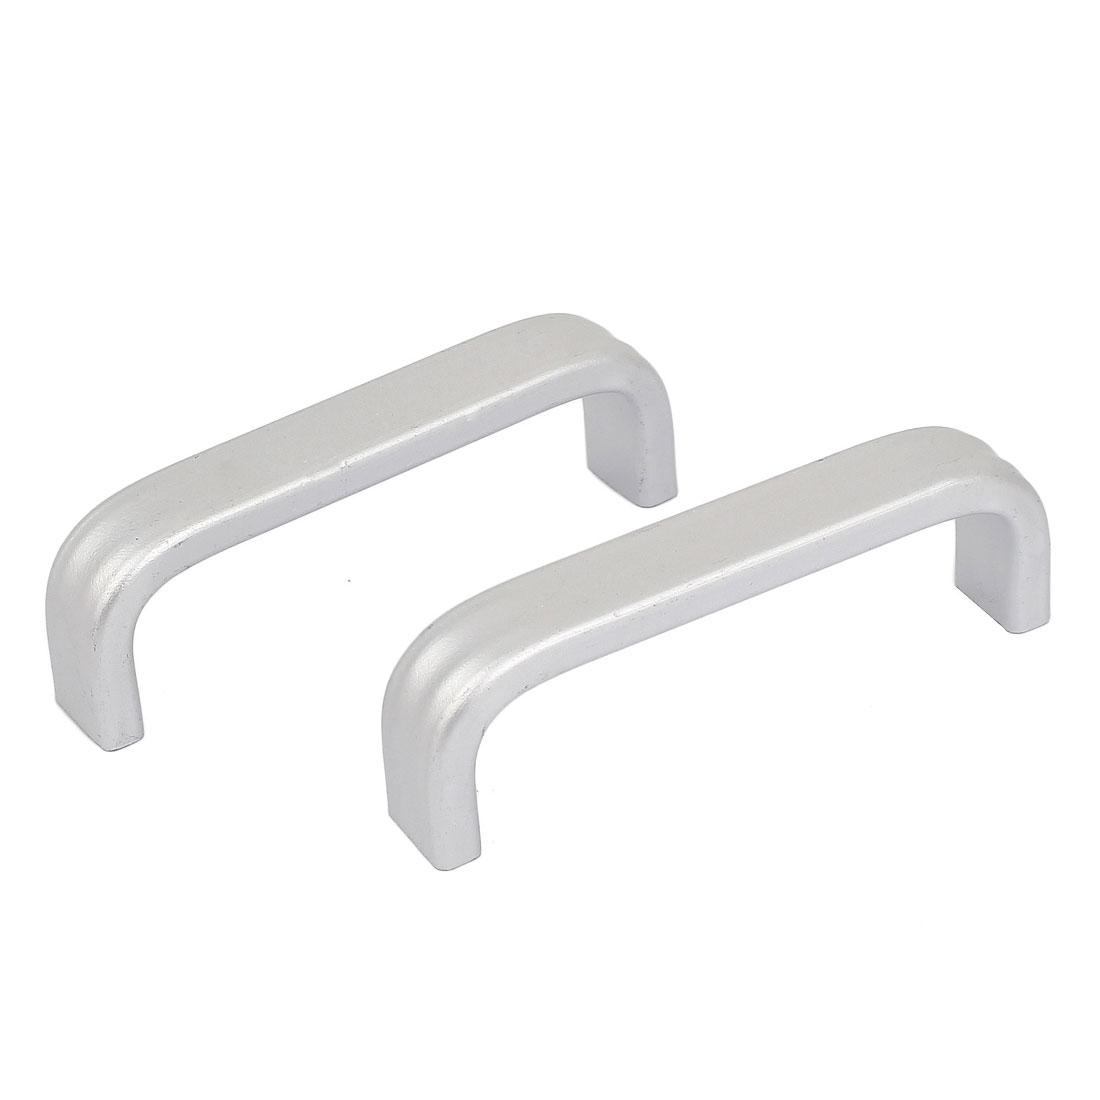 69mm Long Cupboard Kitchen Aluminum Alloy Pull Handles Handware Tool 2pcs